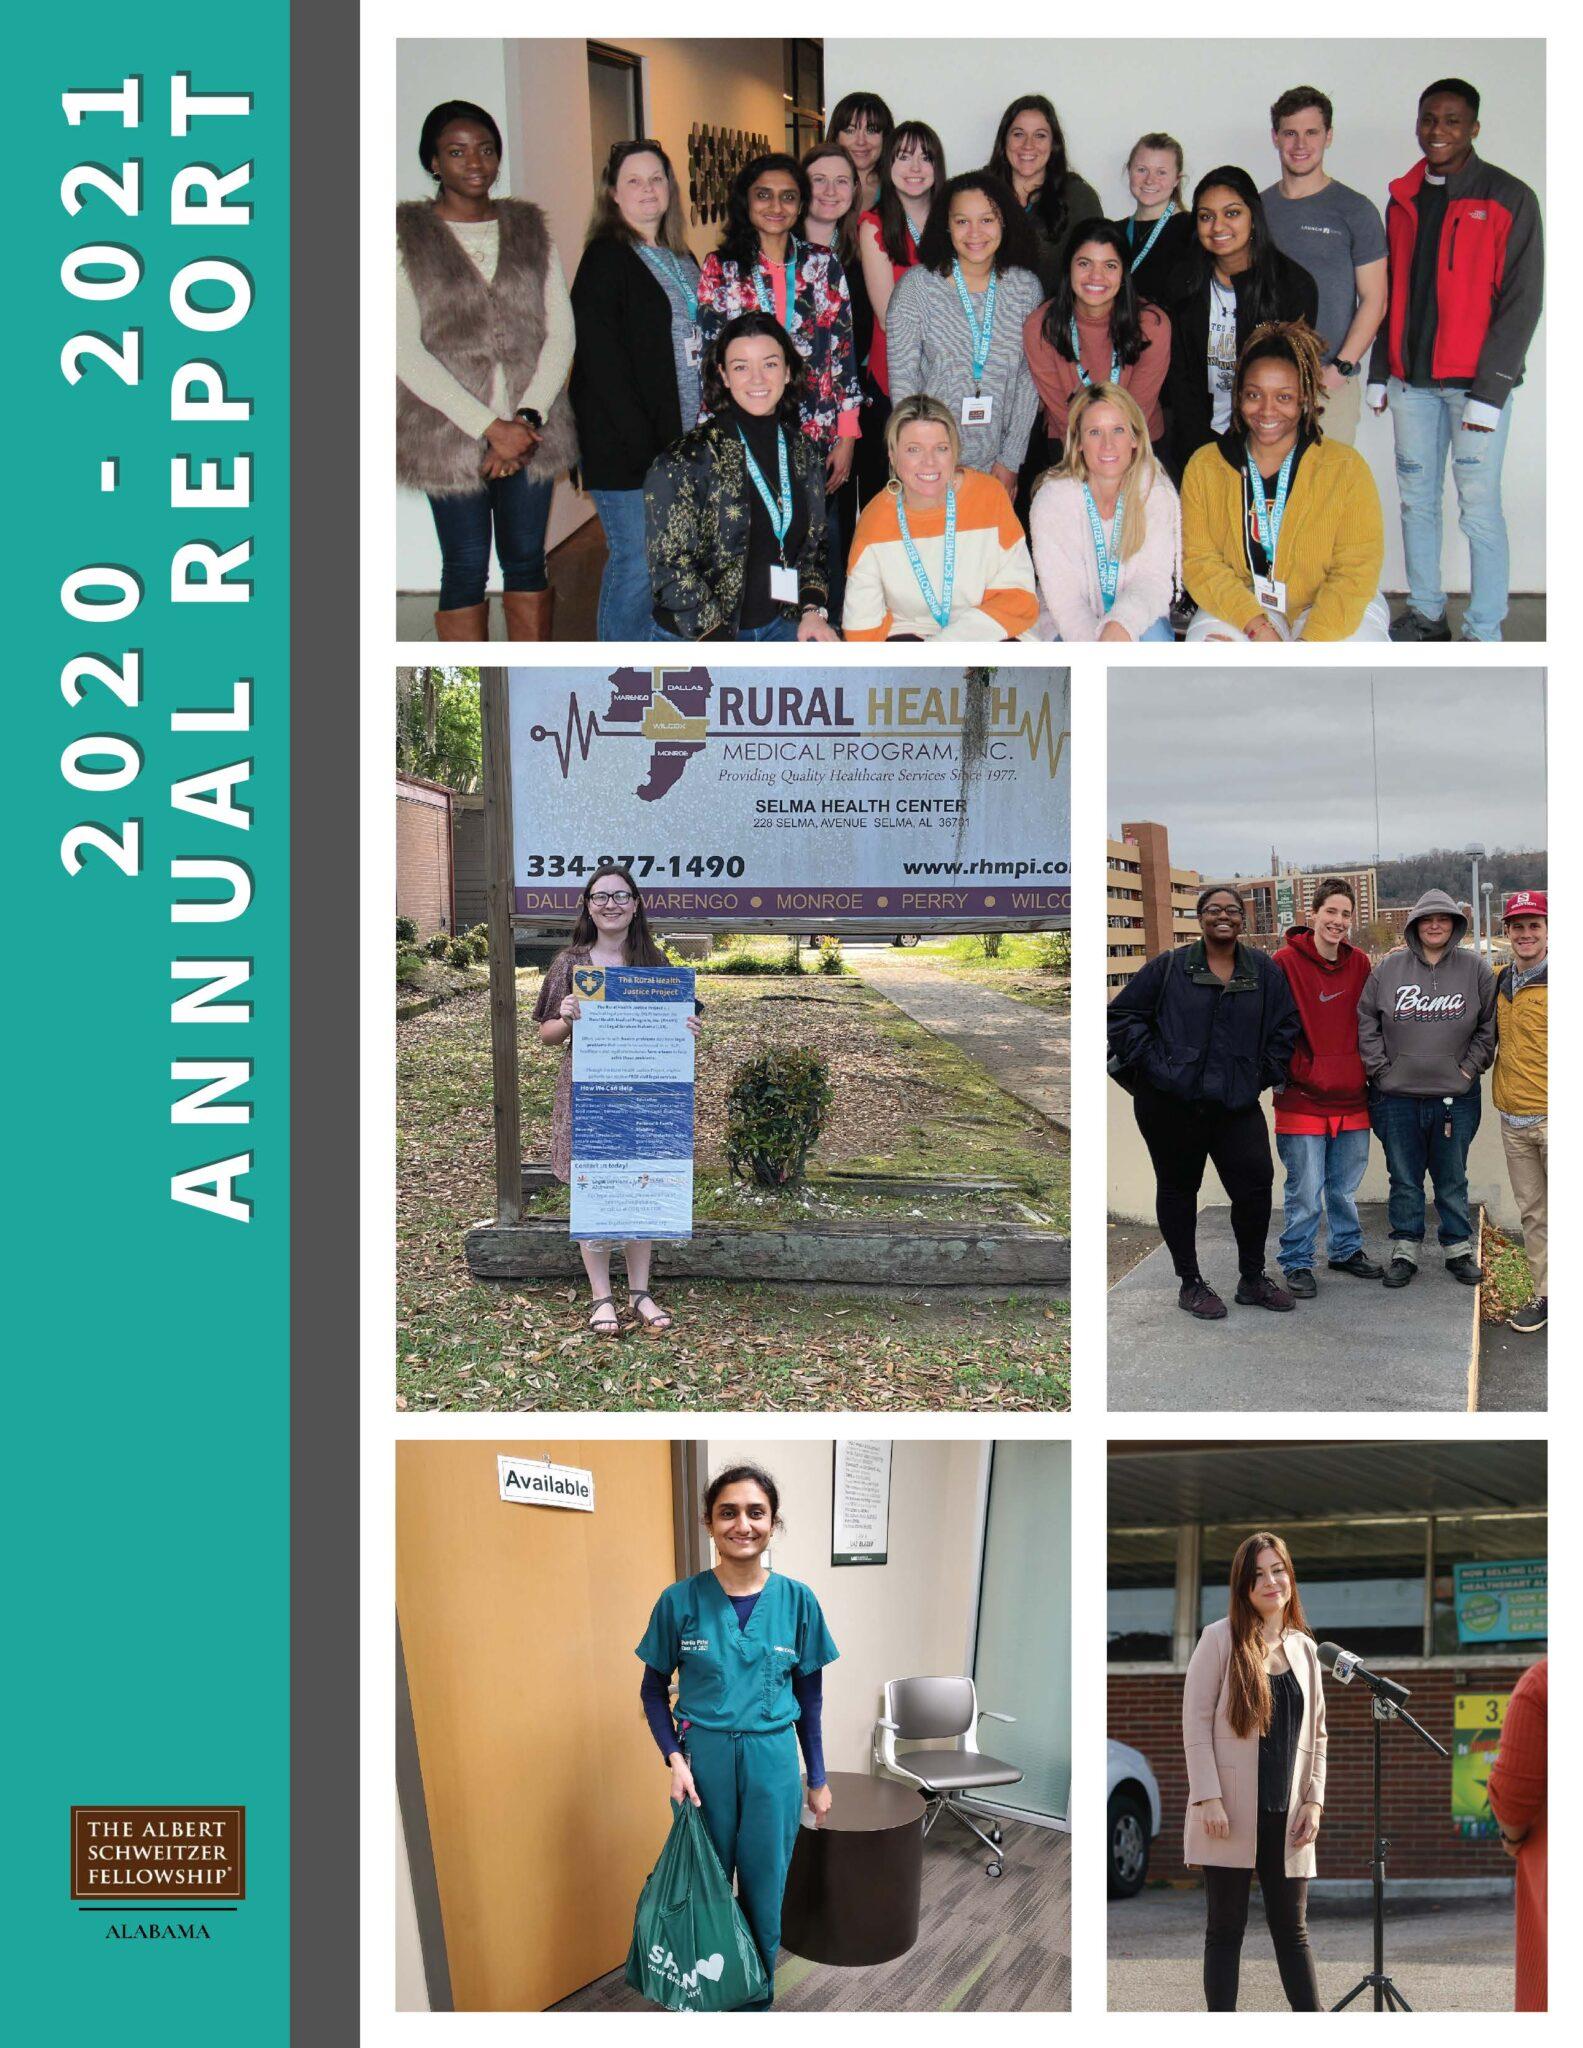 The Albert Schweitzer Fellowship of Alabama Releases 2020-2021 Annual Report